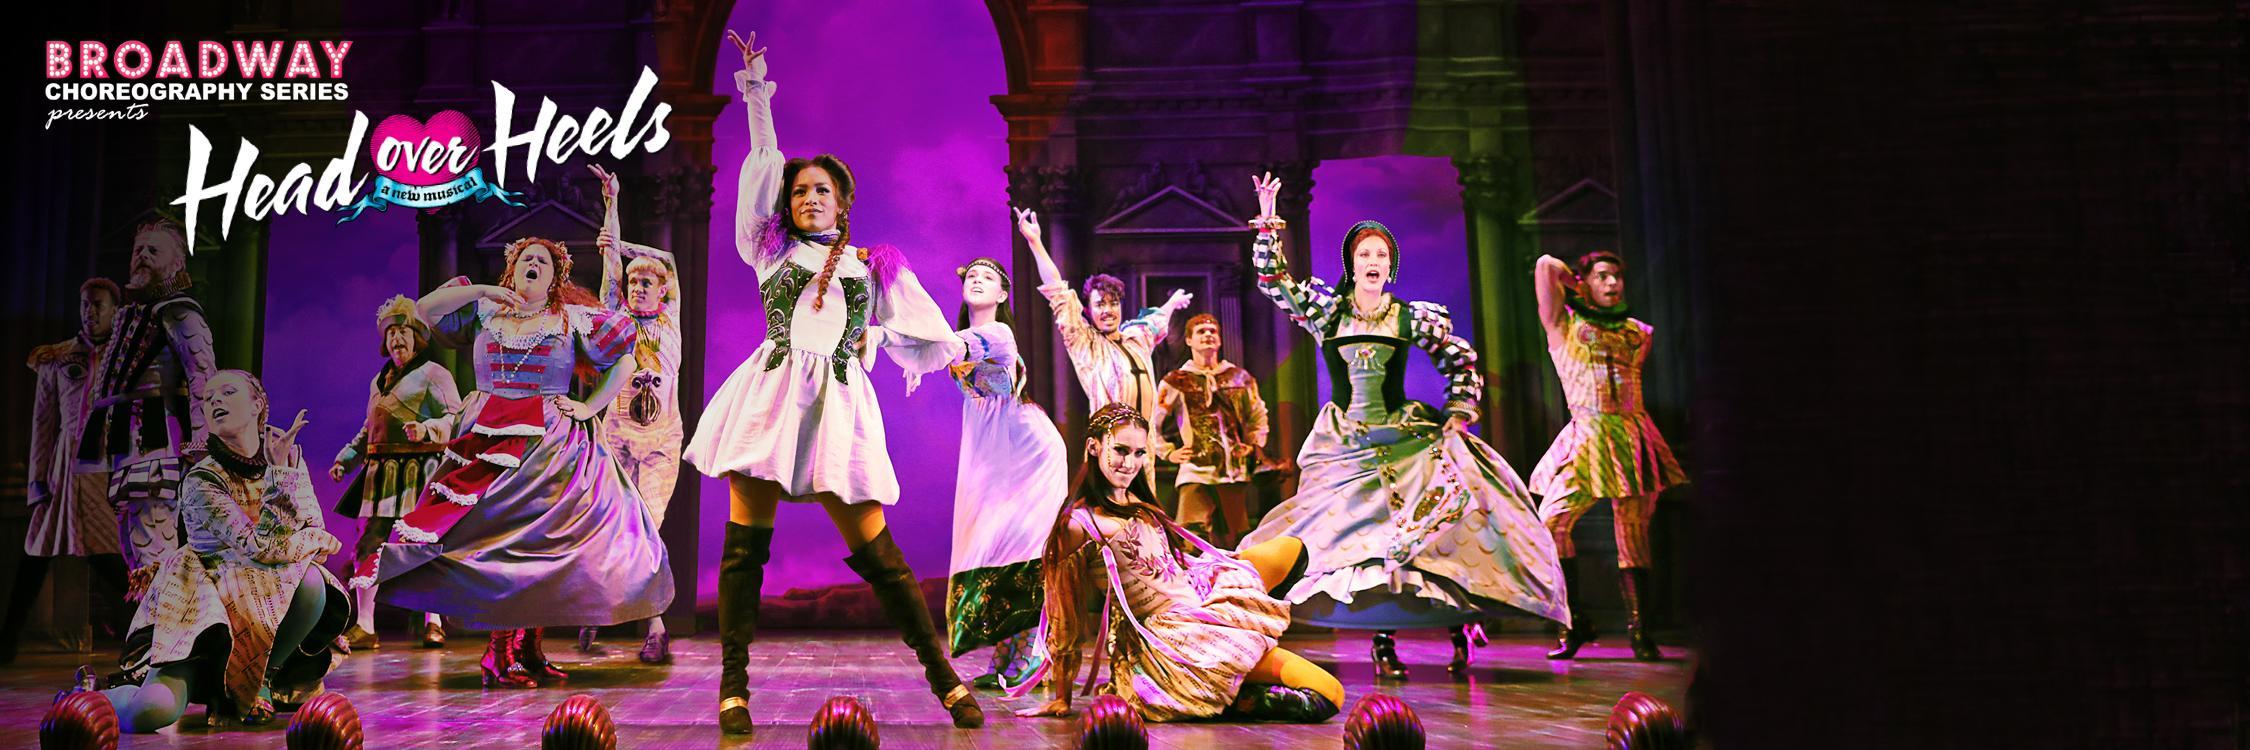 Broadway Choreography Series :: Head Over Heels